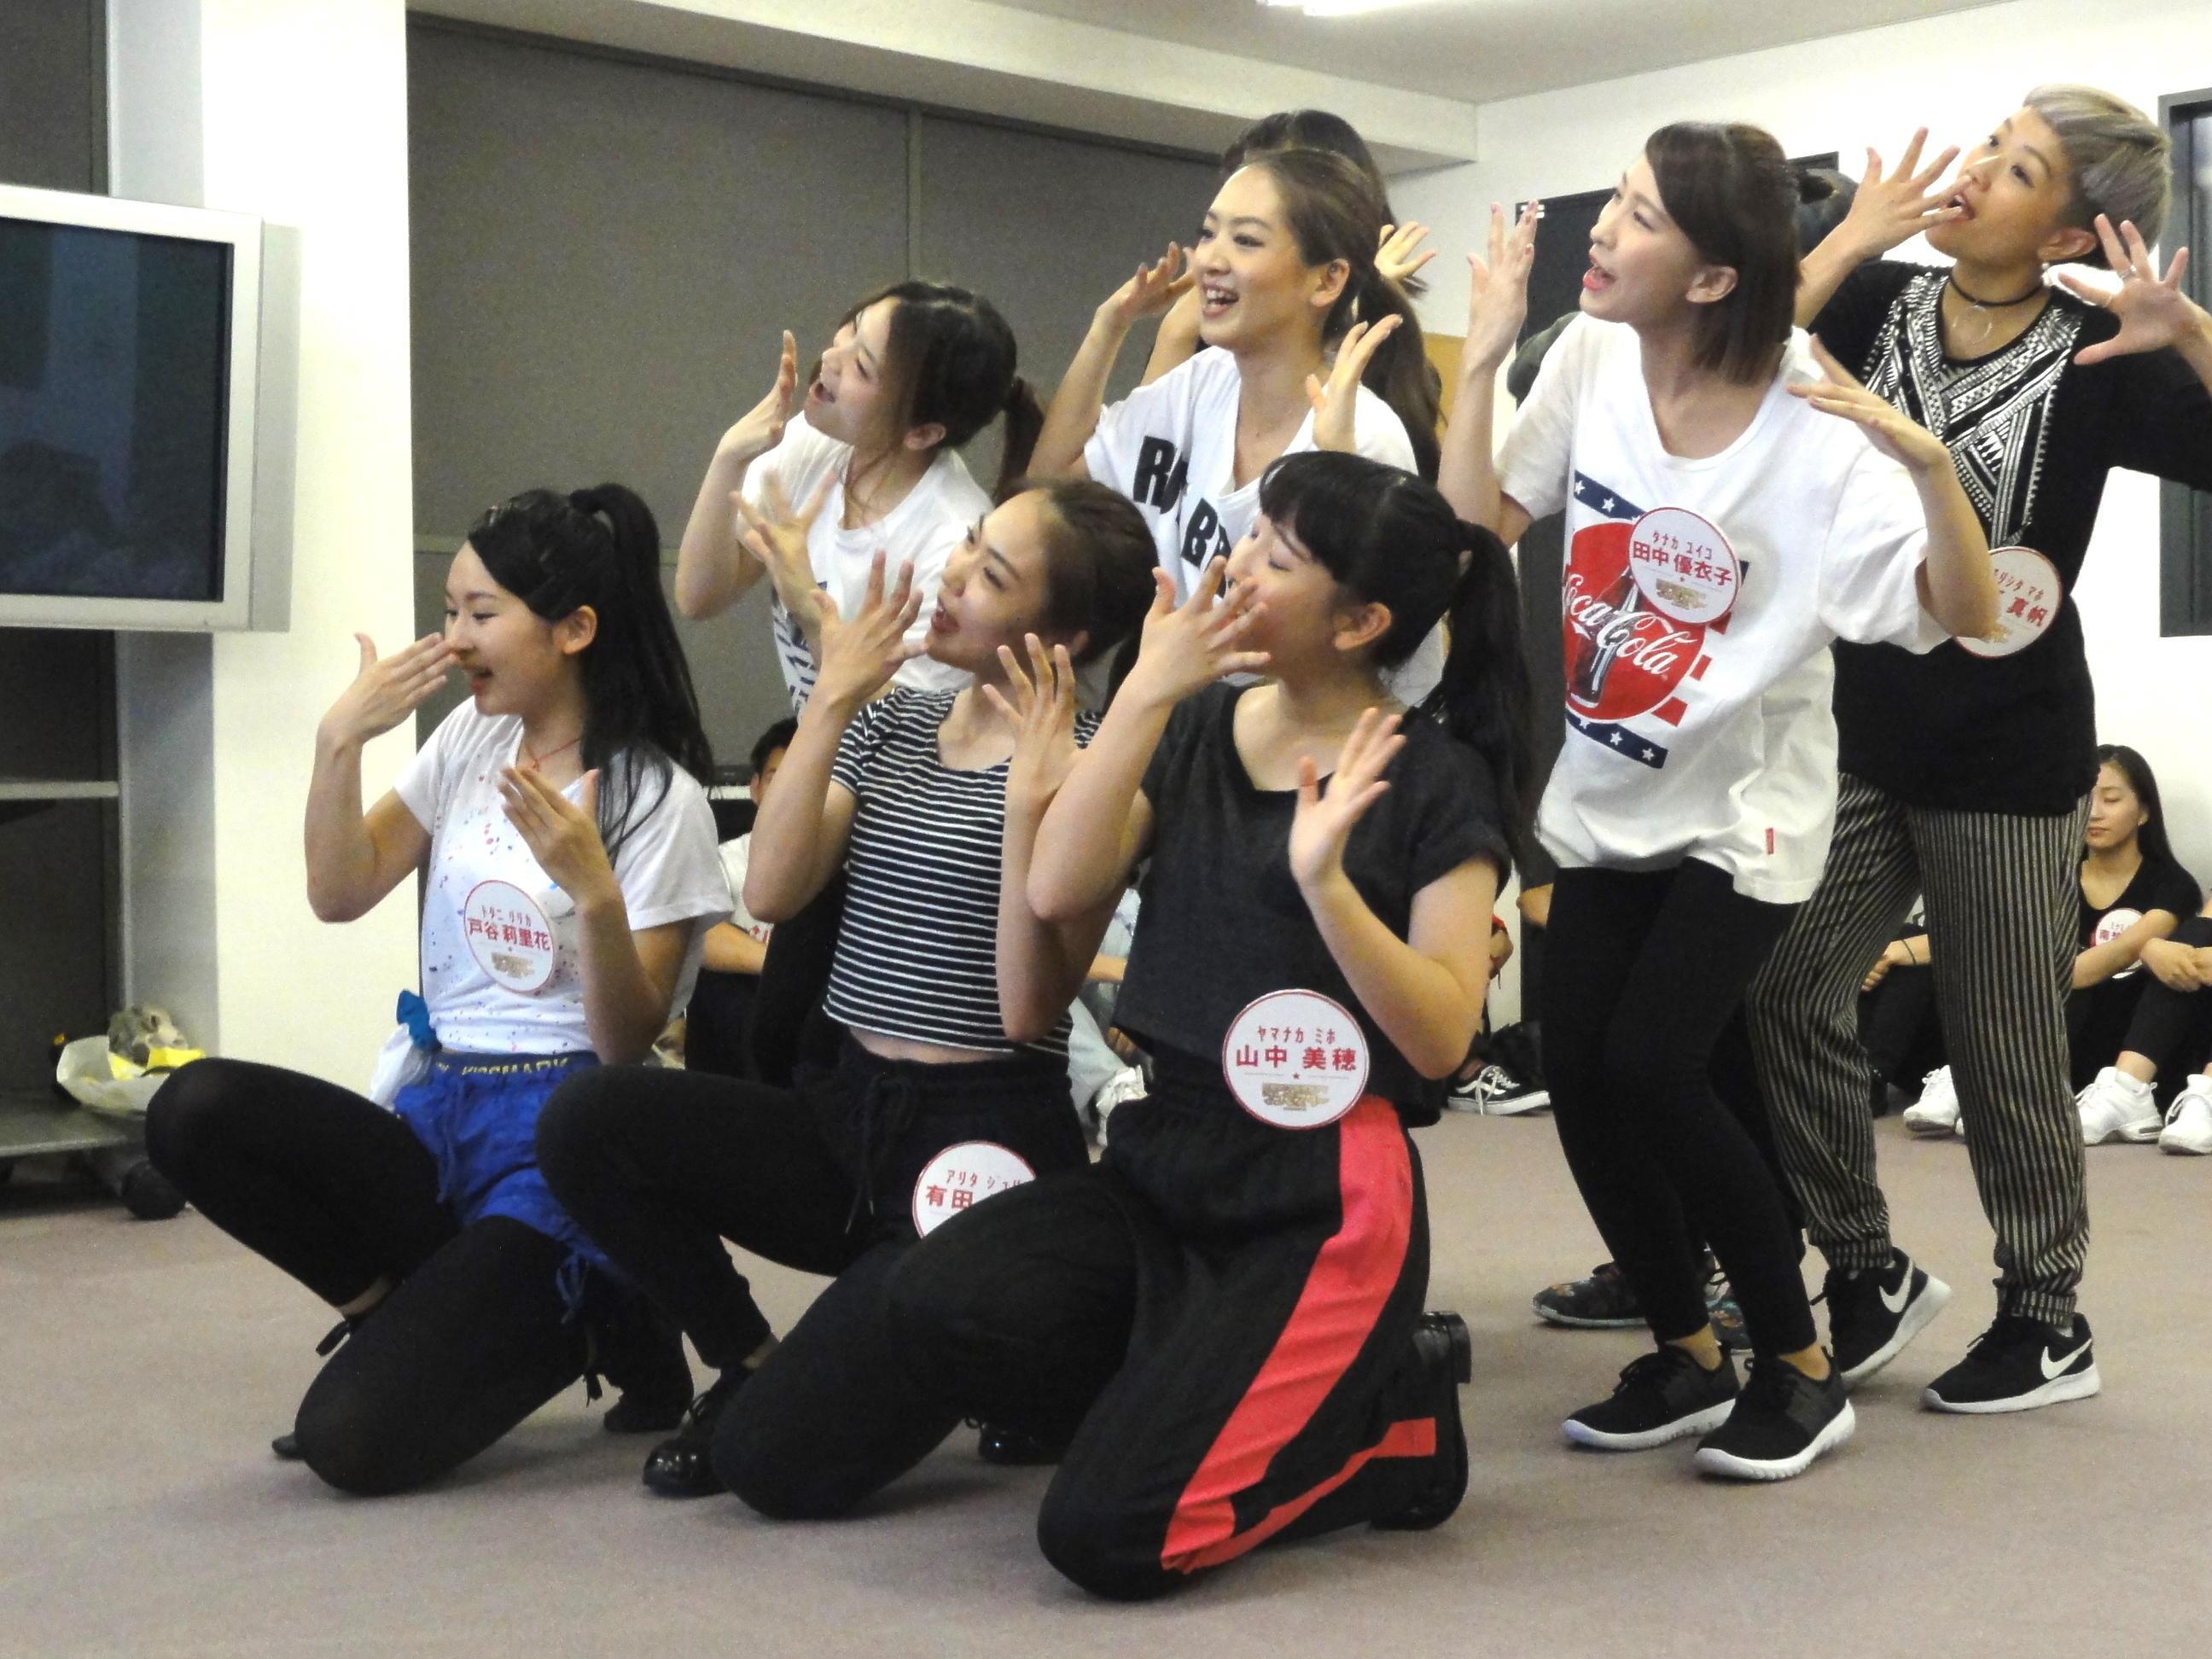 http://news.yoshimoto.co.jp/20170727165457-b7066babe3db7d99b5a7b836f1837484c042384e.jpg